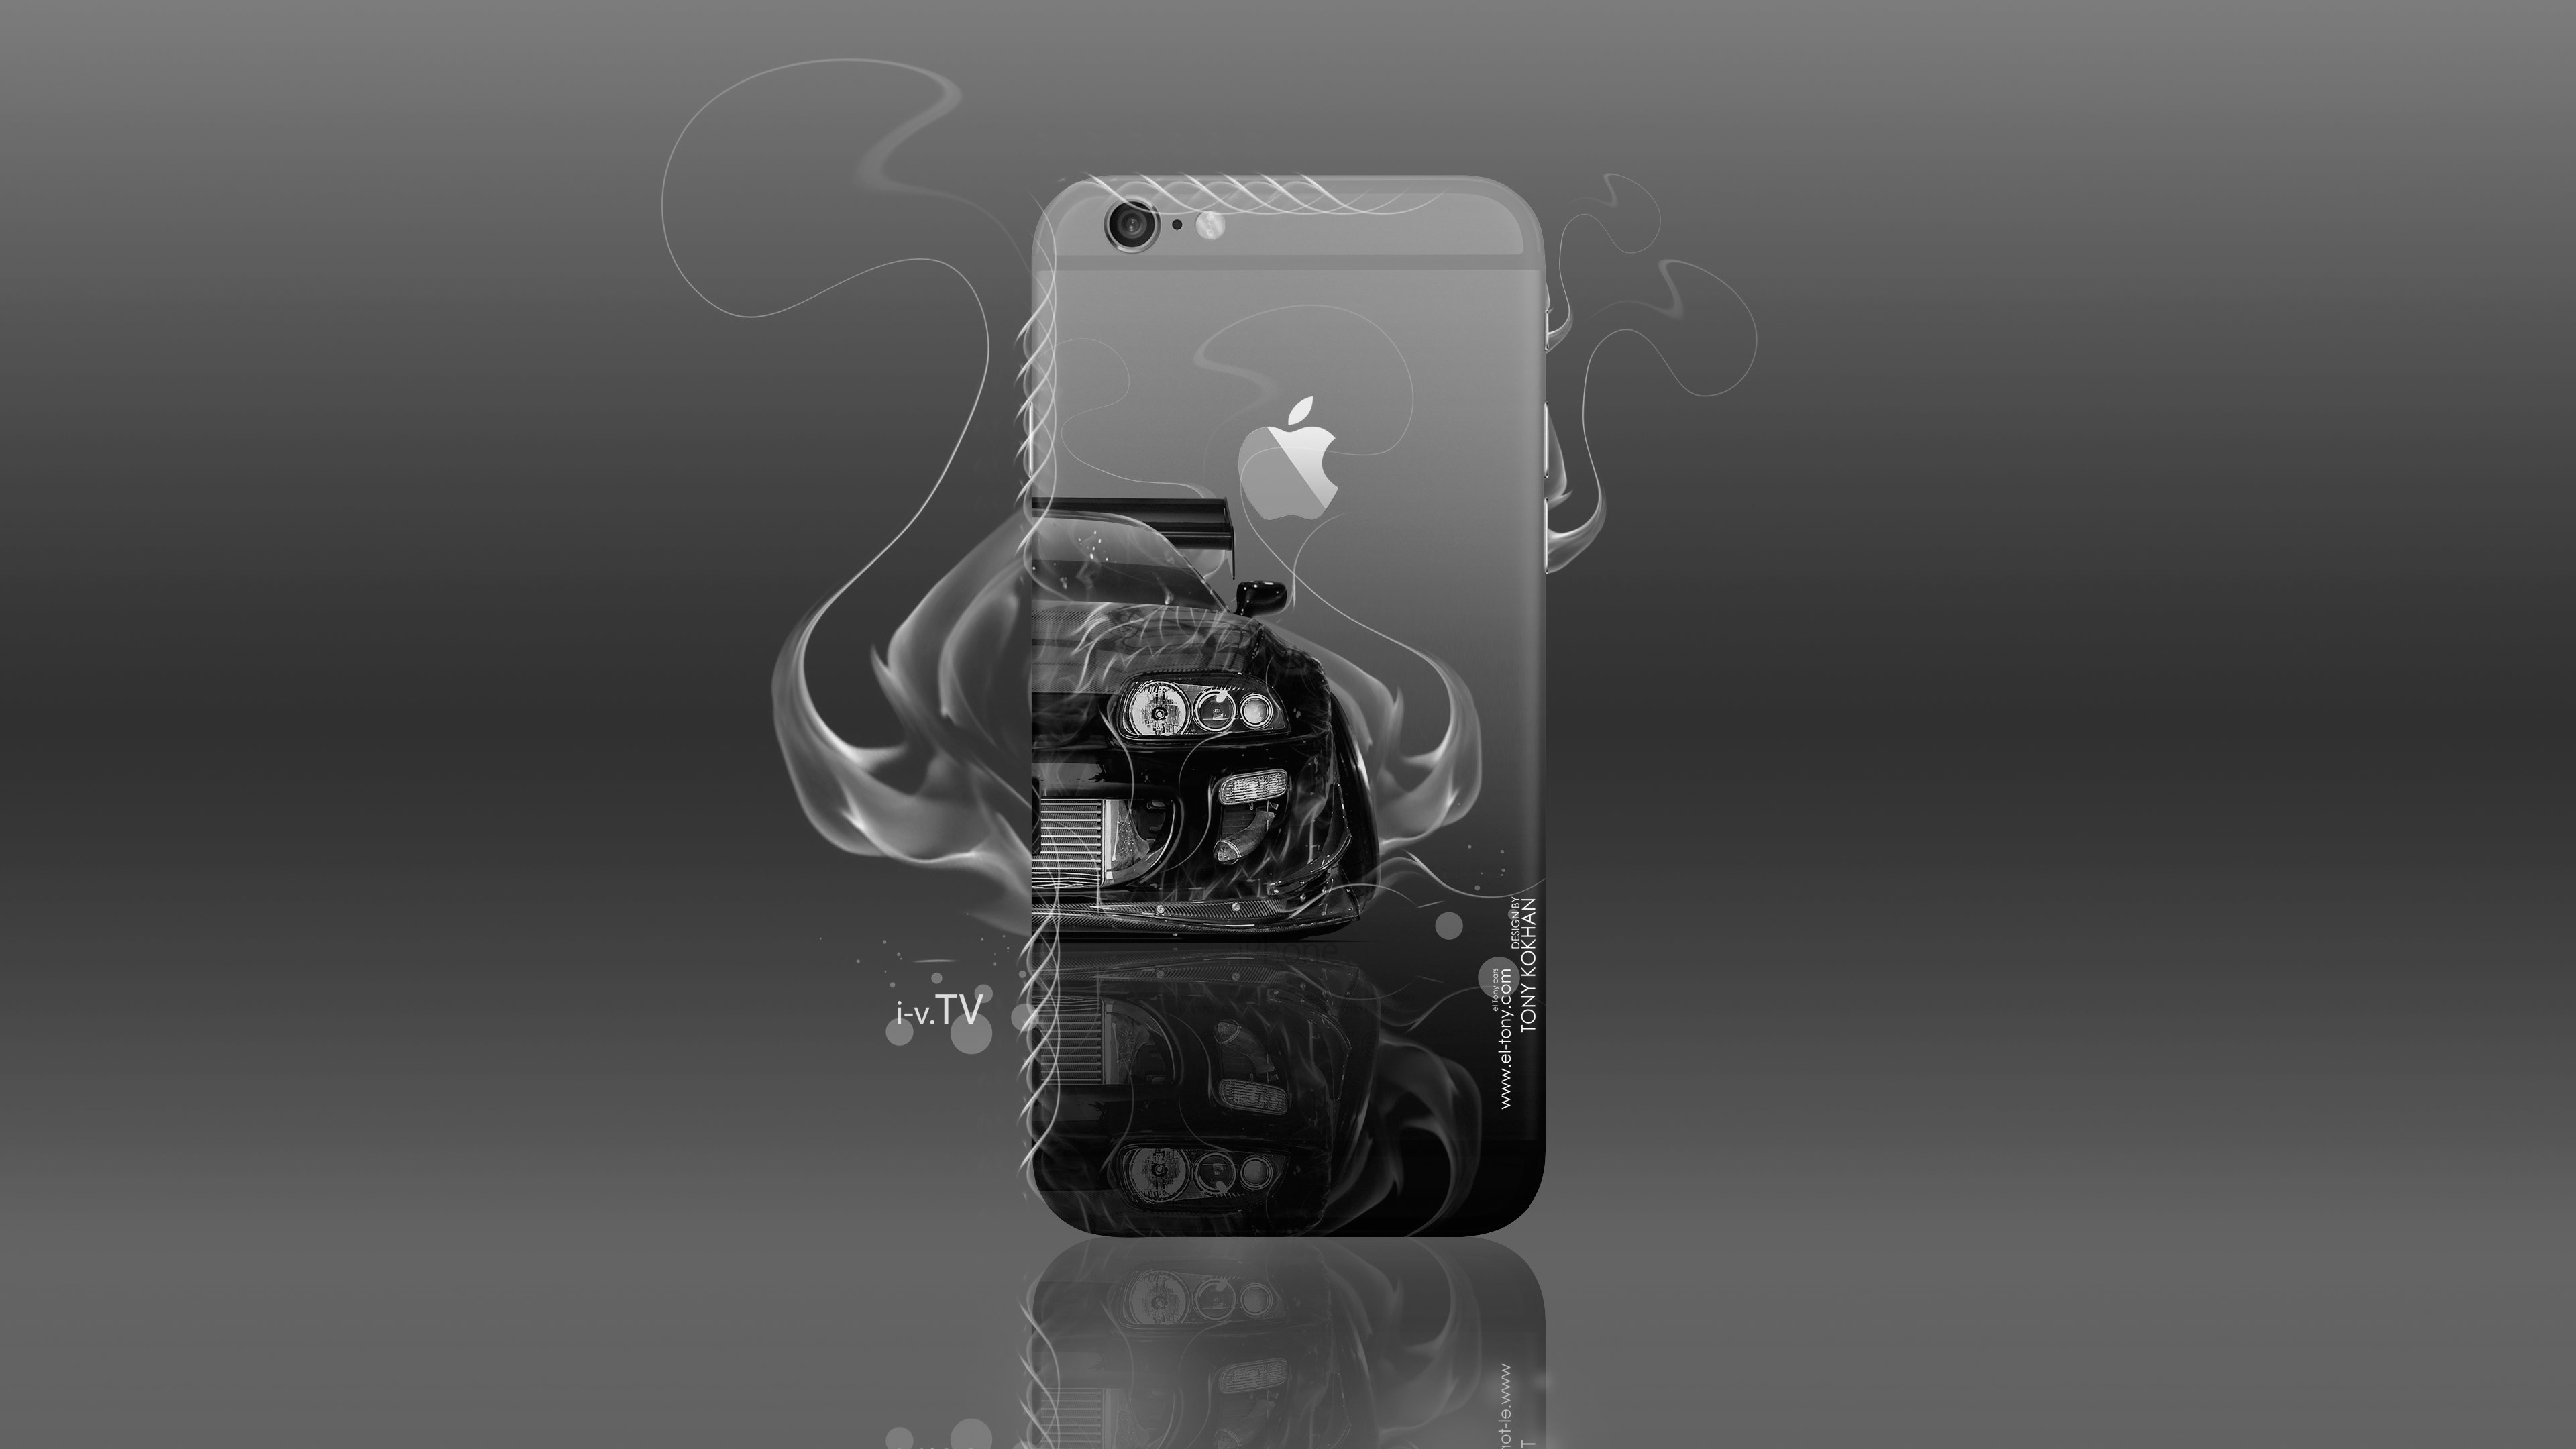 … apple-iphone-6-plus-gadget-appletony-back-logo-